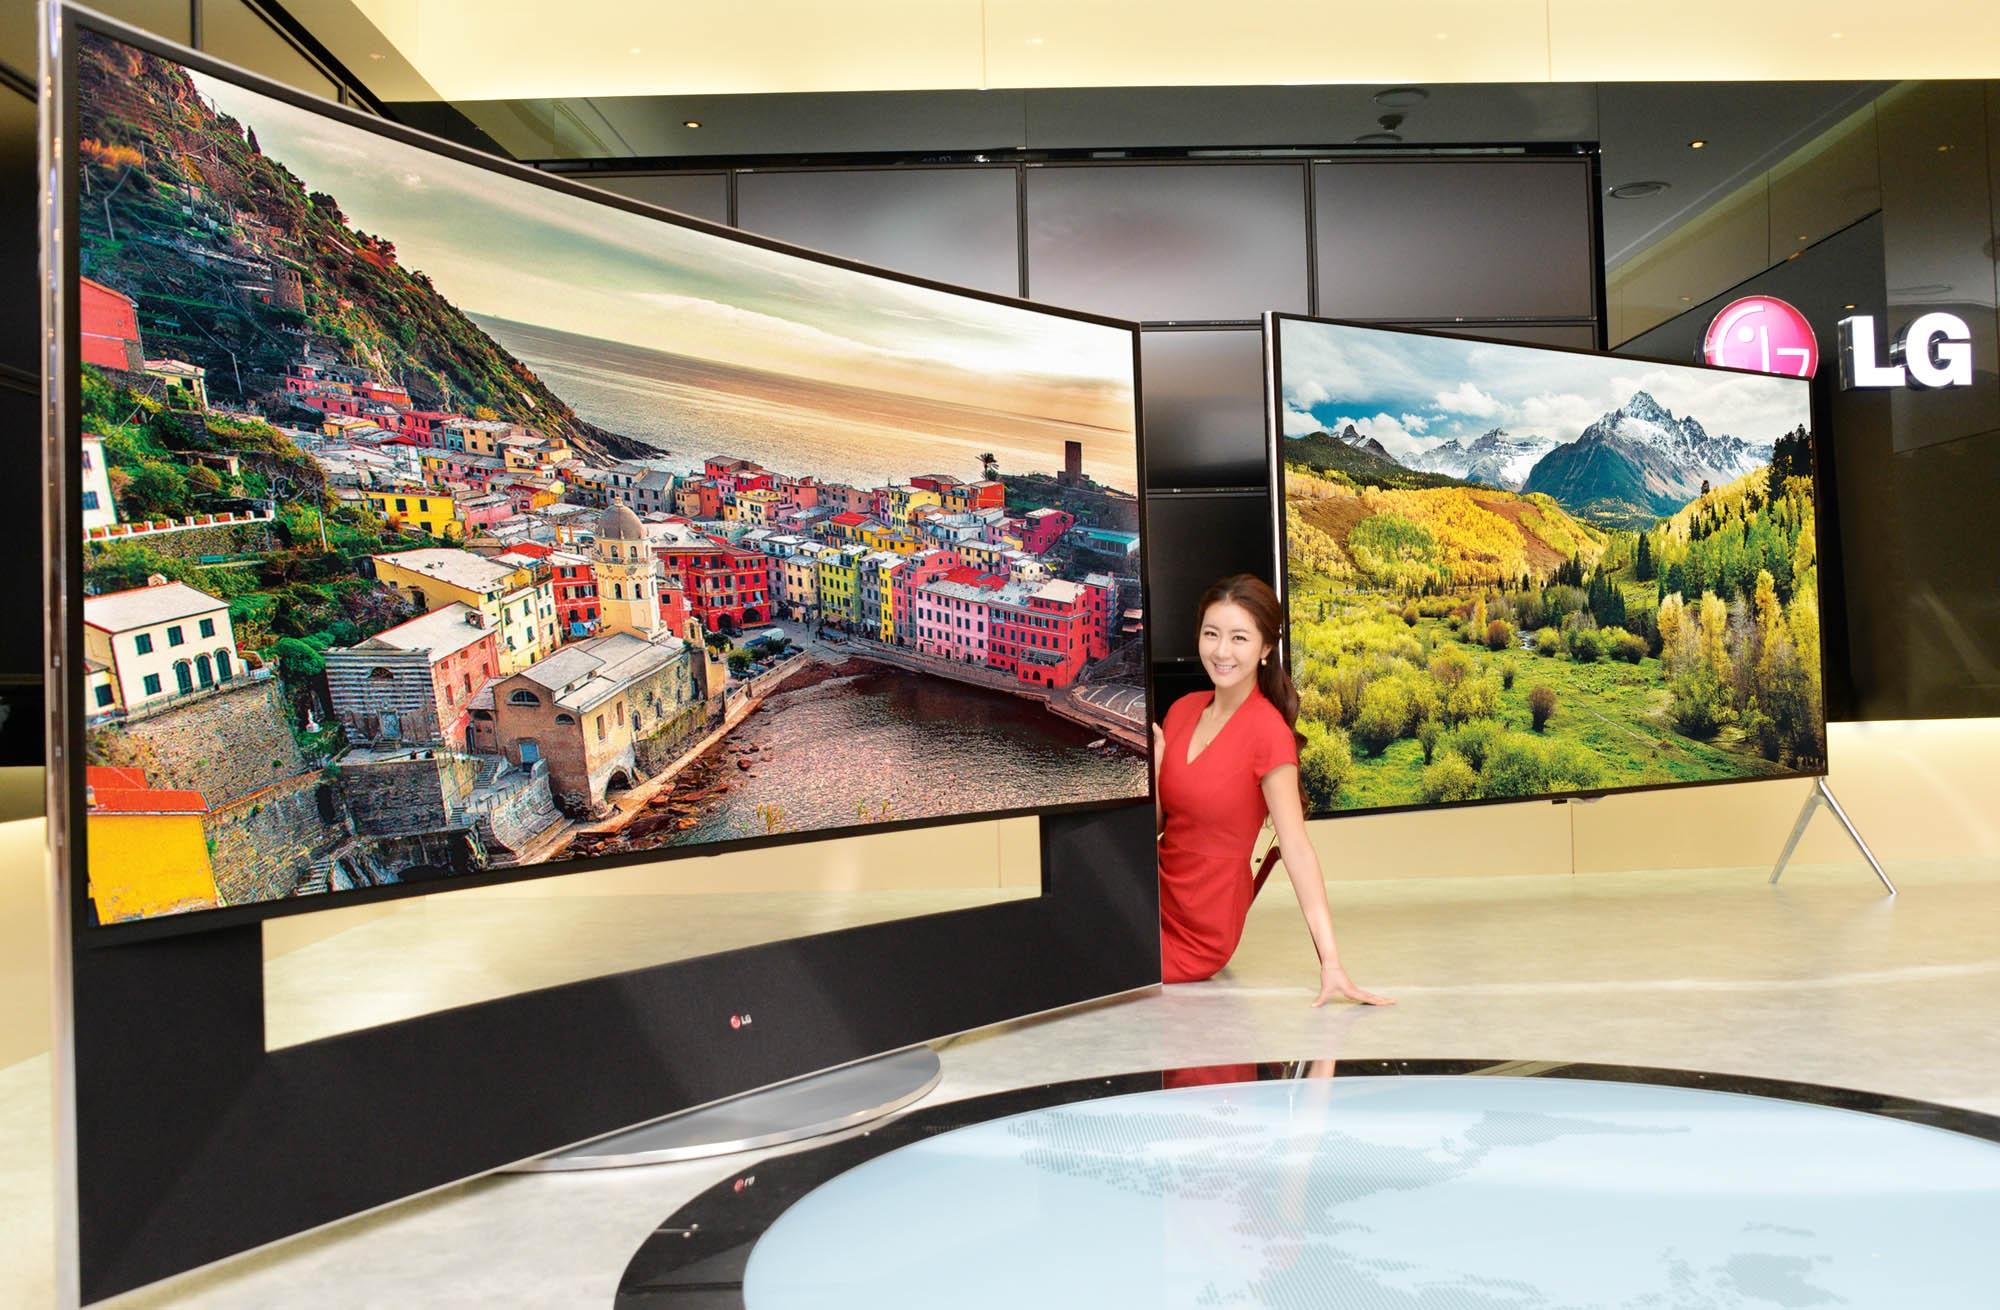 A model demonstrating LG CURVED ULTRA HD TV model UB9800